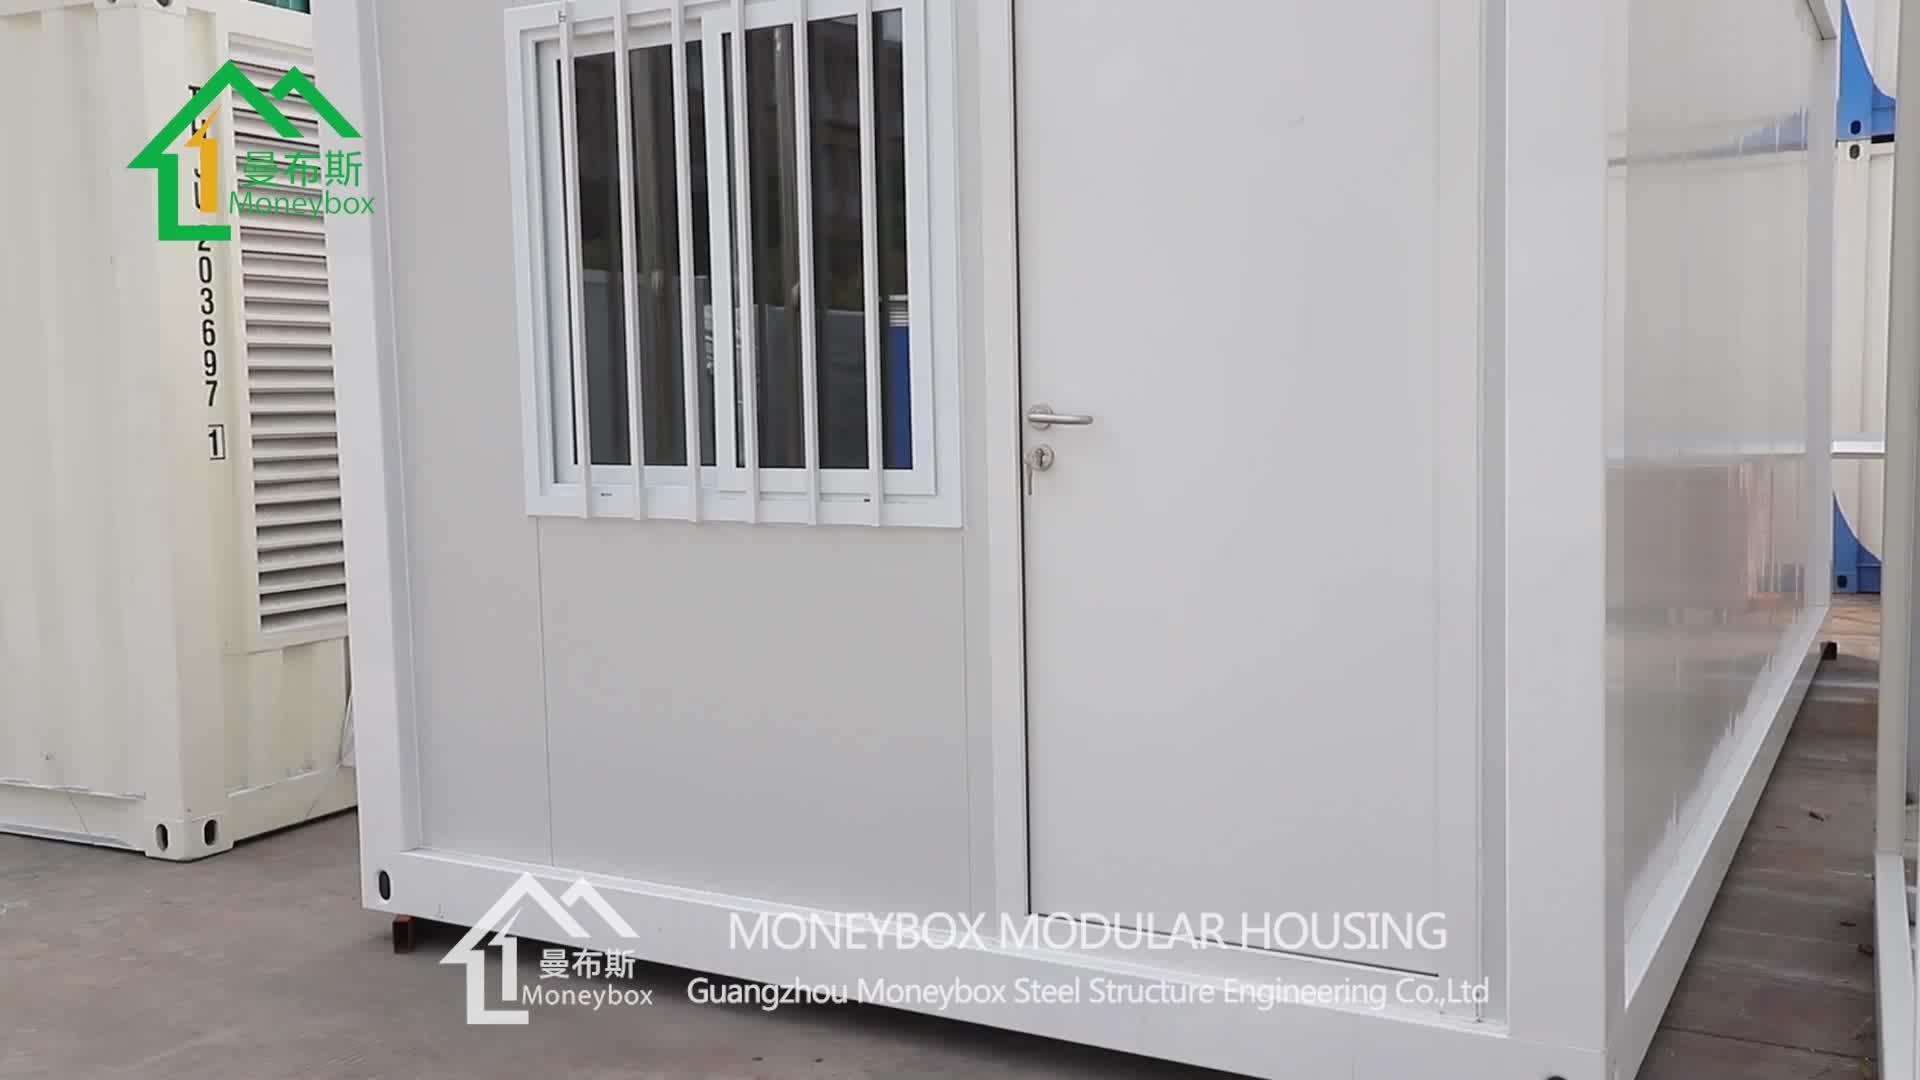 Snelle Montage Flat Pack Zonne-energie Prefab Huis